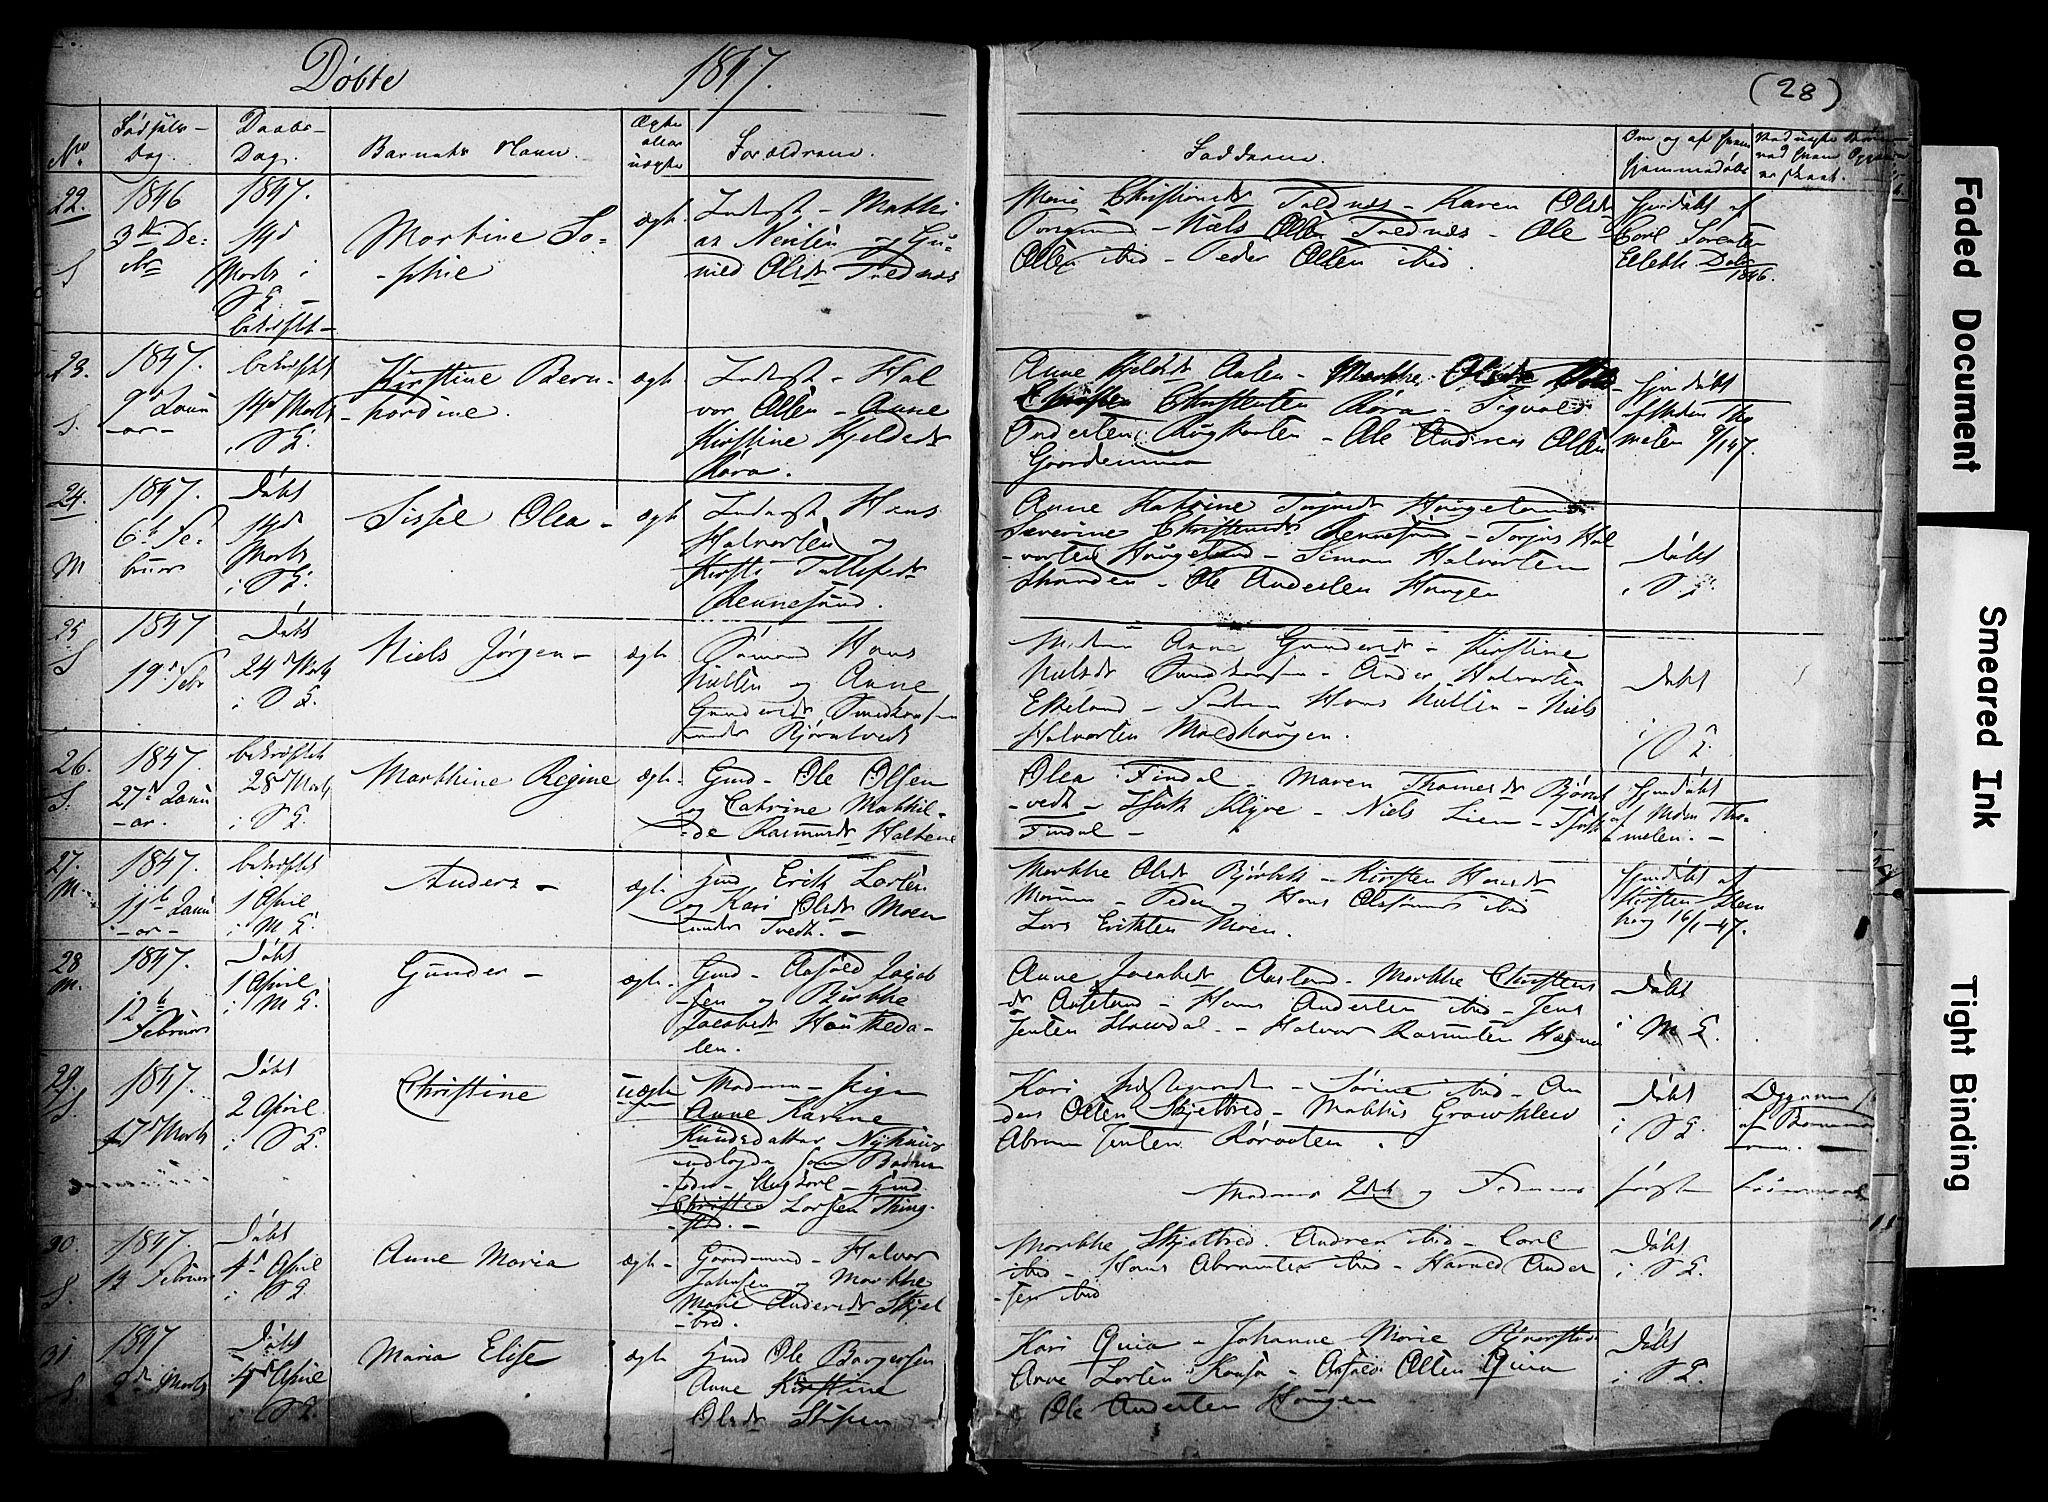 SAKO, Solum kirkebøker, F/Fa/L0006: Ministerialbok nr. I 6, 1844-1855, s. 28